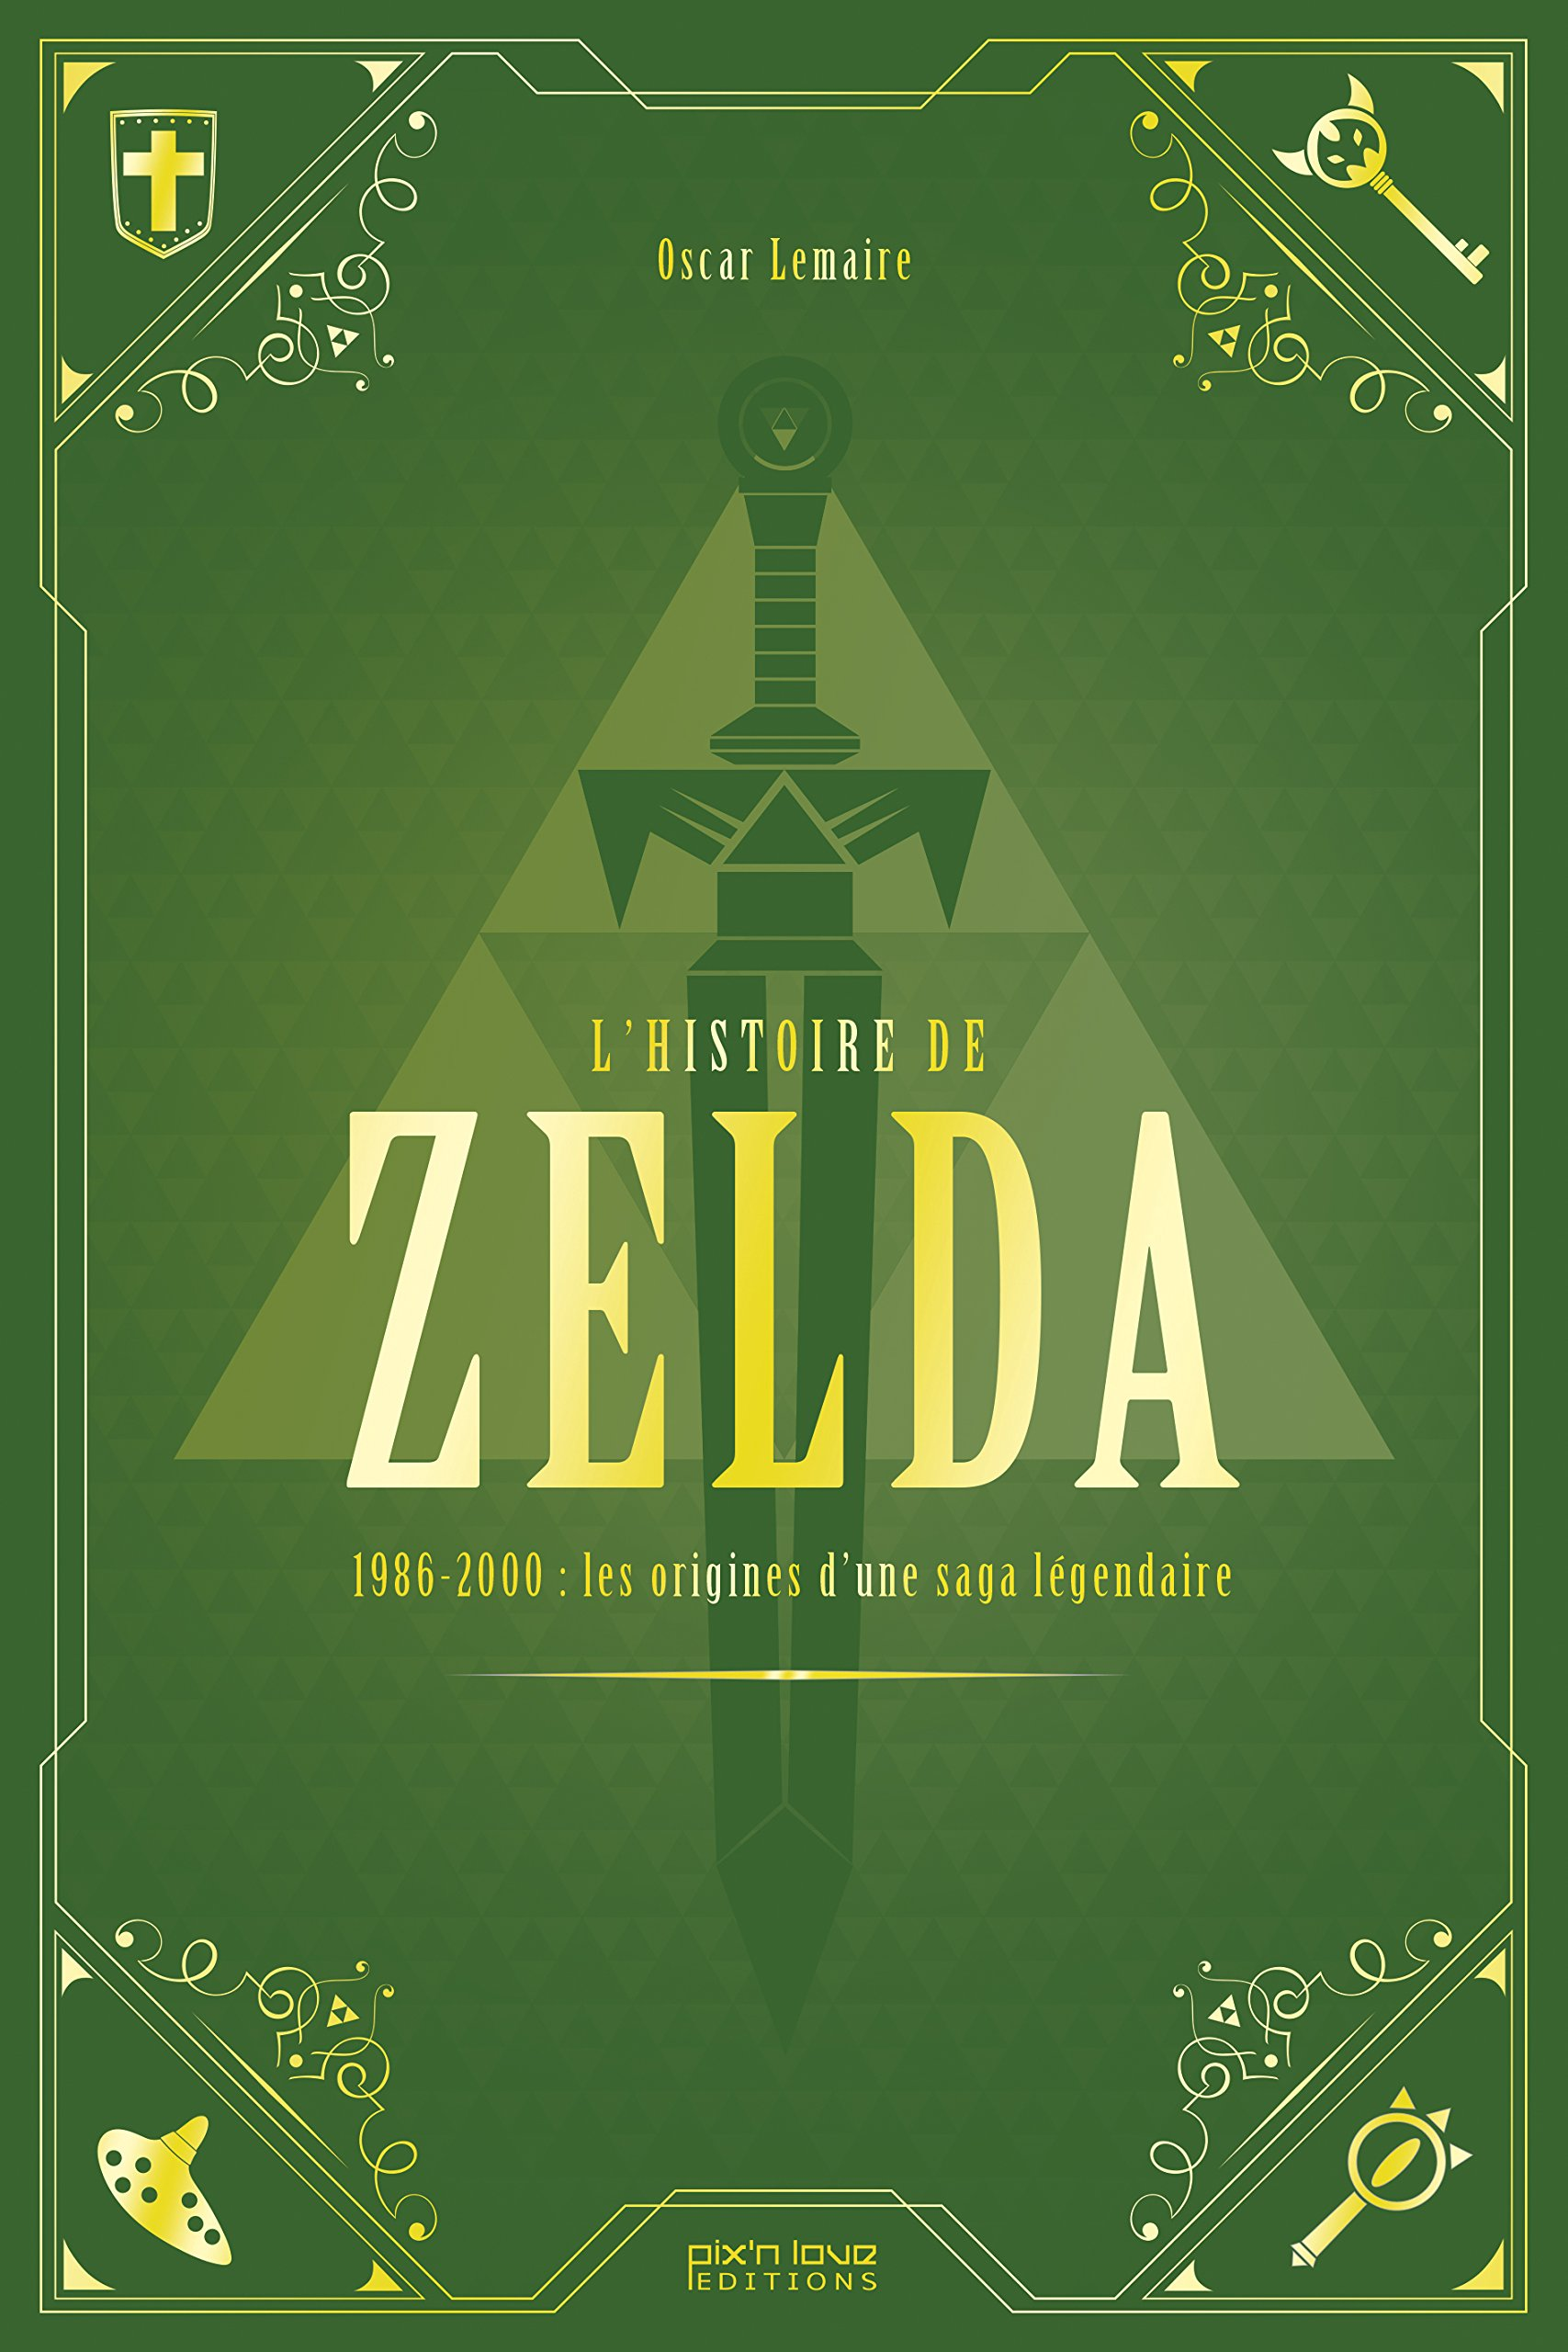 L'Histoire de Zelda (Pix'n Love) bientôt disponible